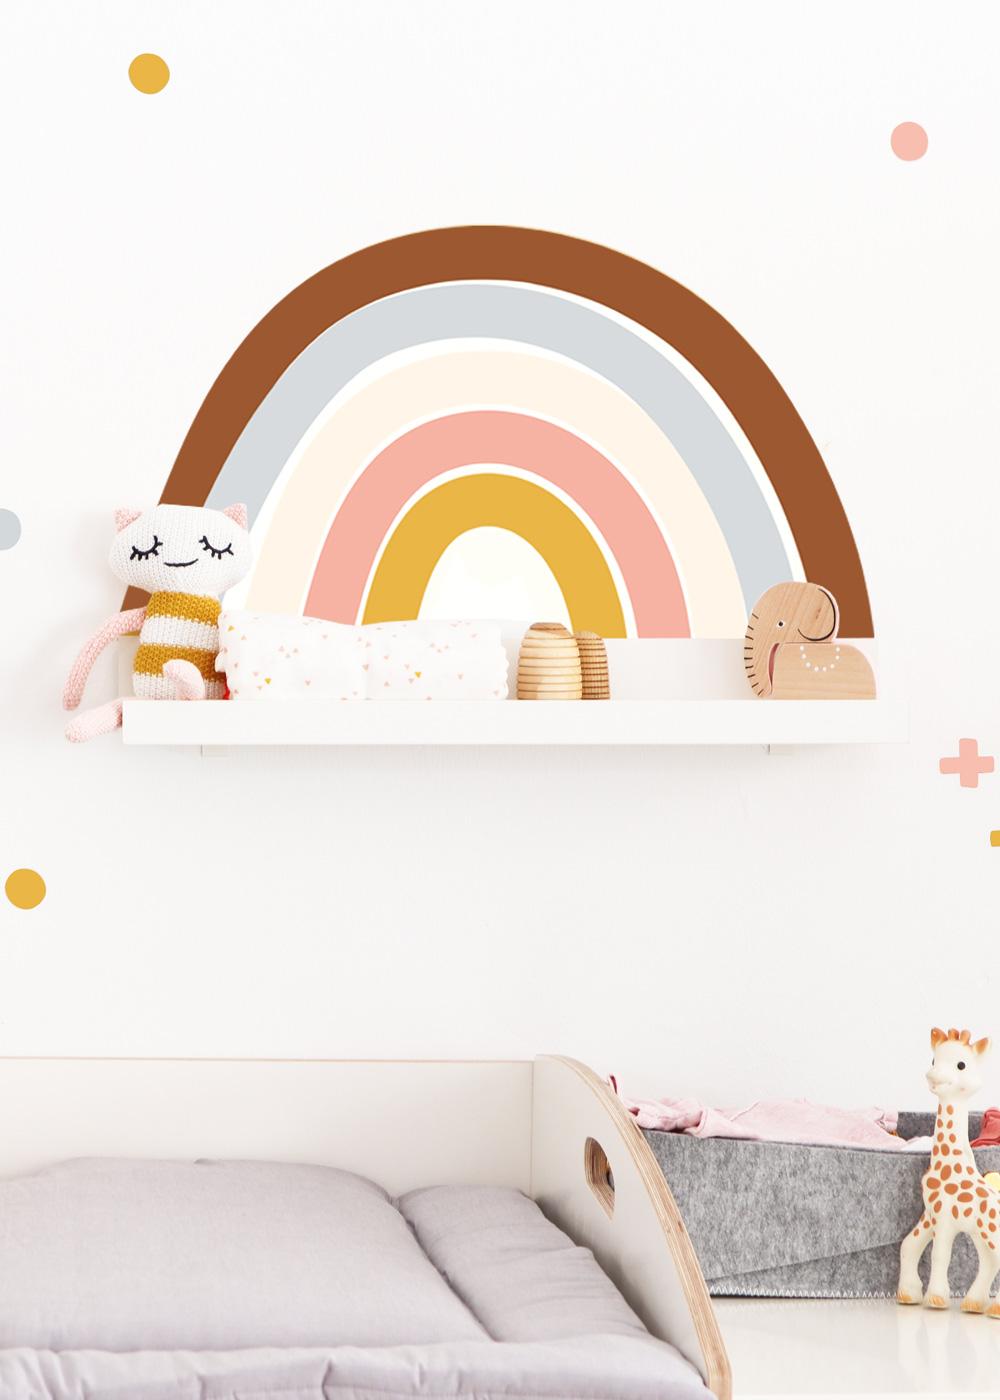 Ikea Mosslanda Bilderleiste Vielfalt Regenbogen Camel rose Gesamtansicht